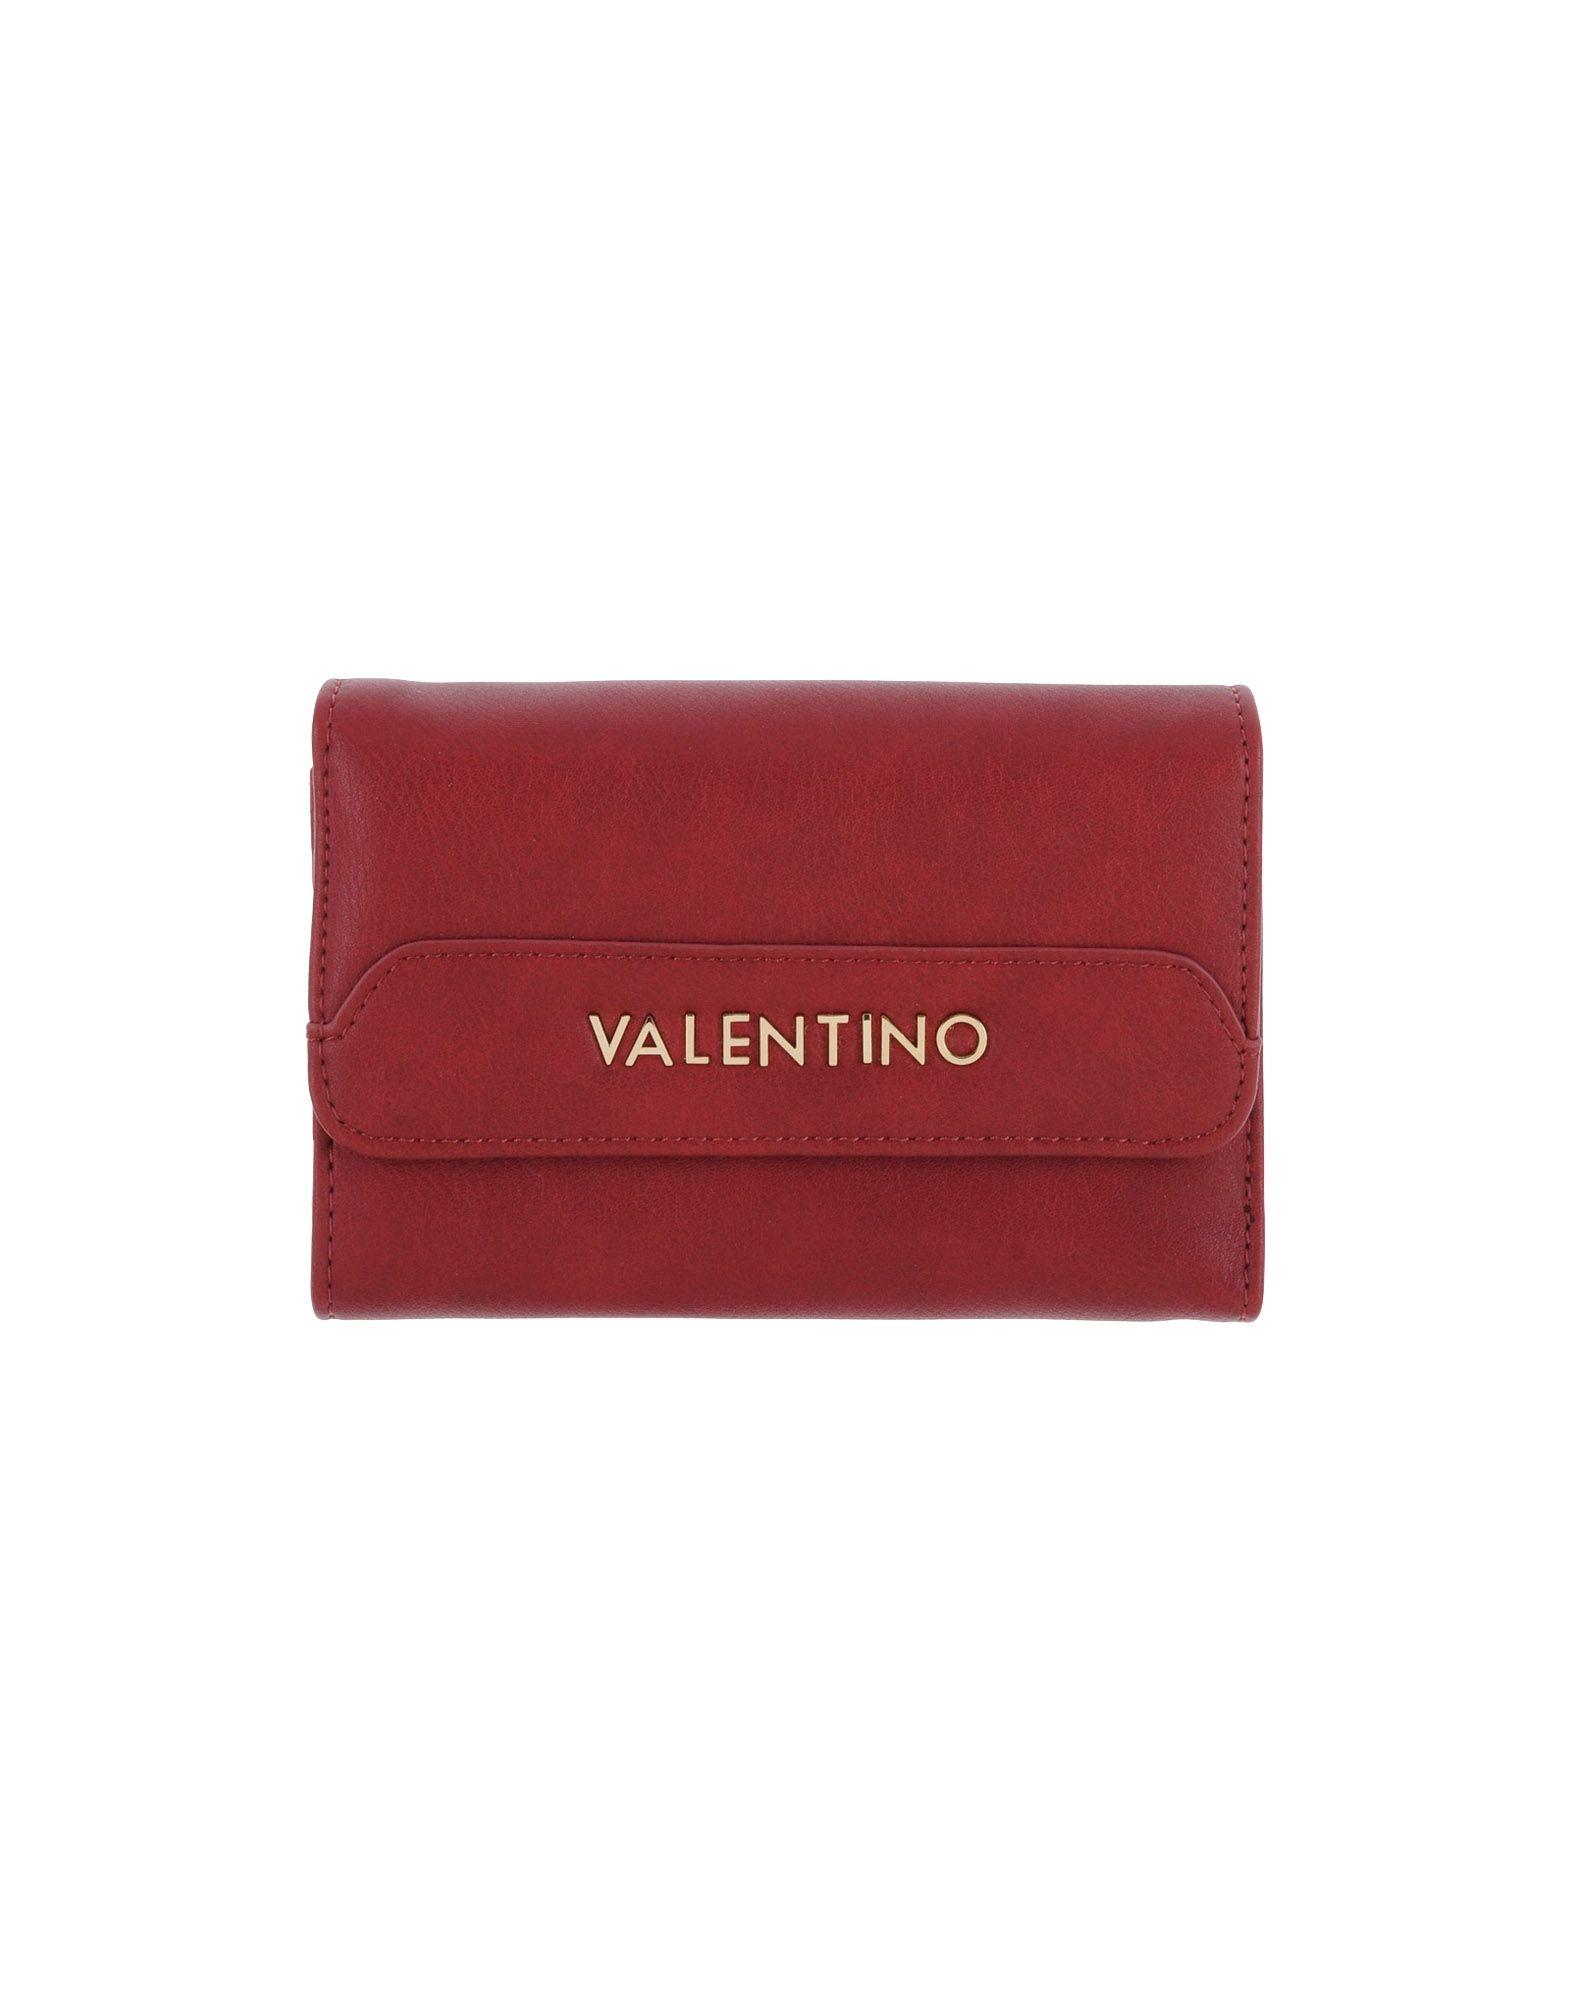 MARIO VALENTINO Damen Brieftasche Farbe Bordeaux Größe 1